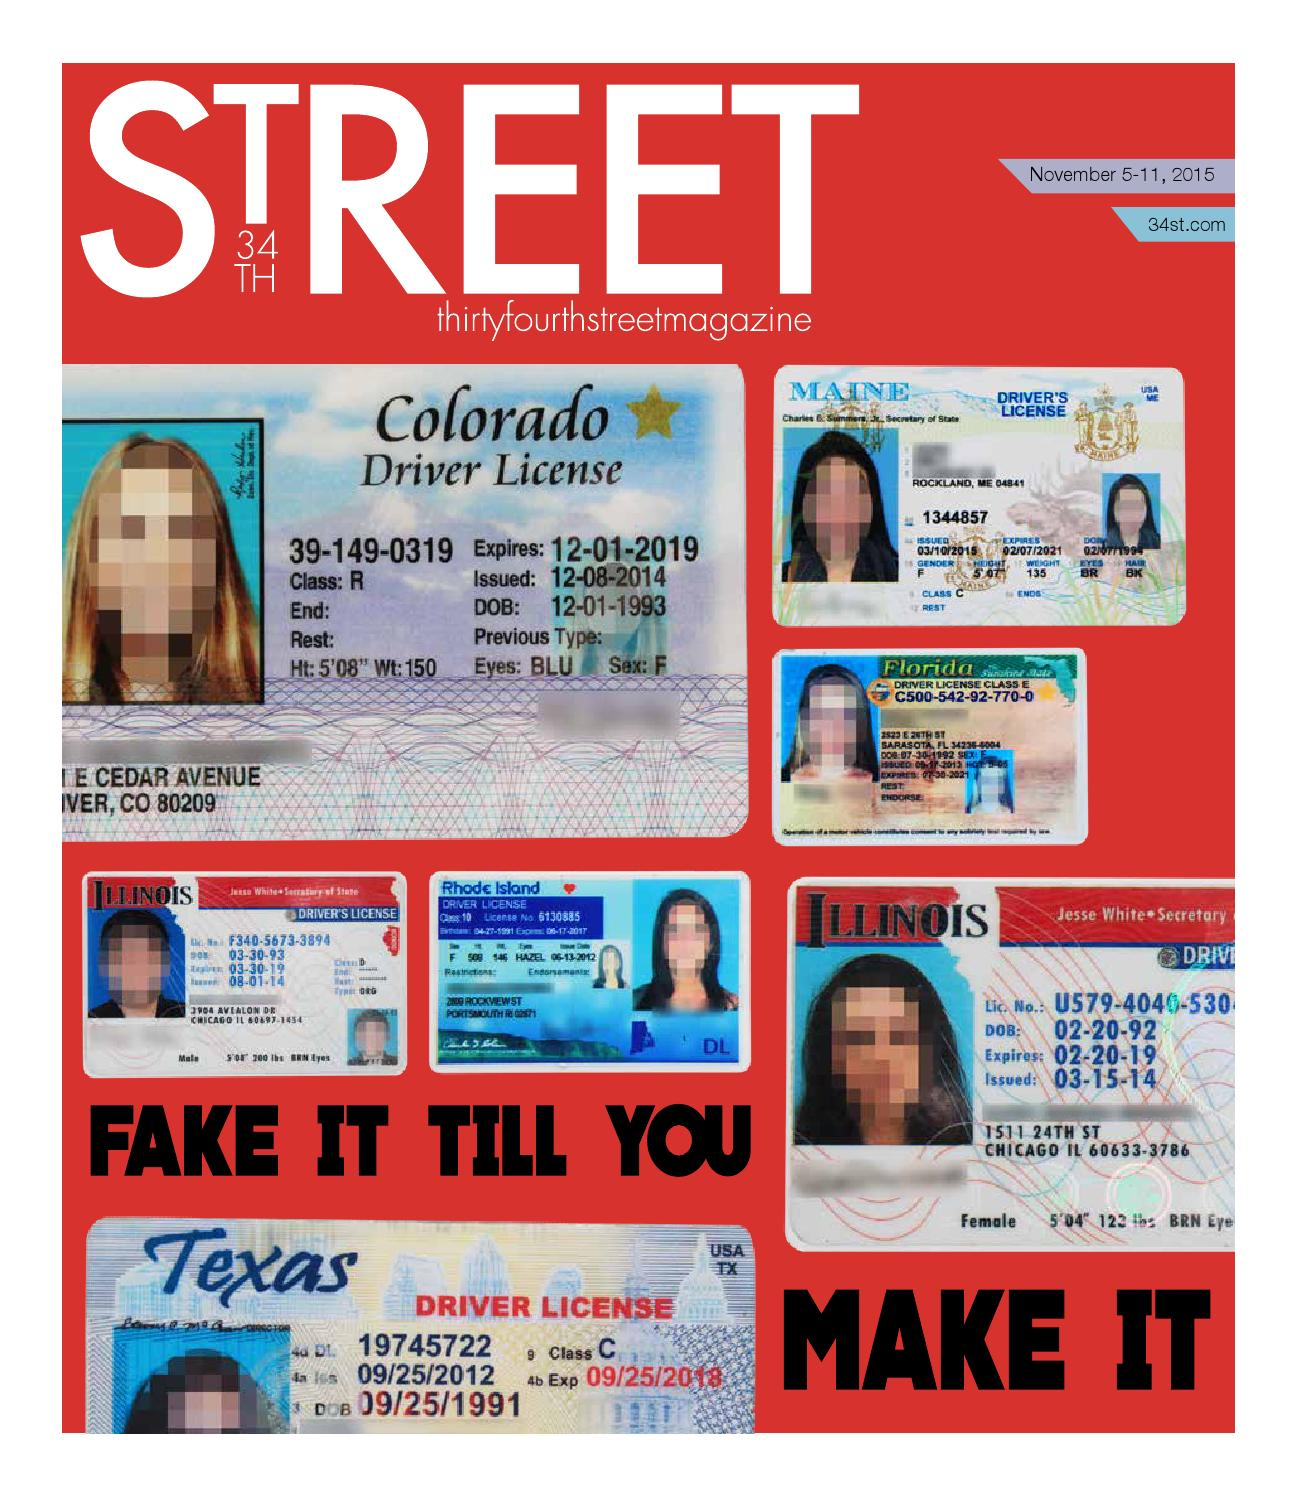 Asw-149 Porn 11.05.1534th street magazine - issuu